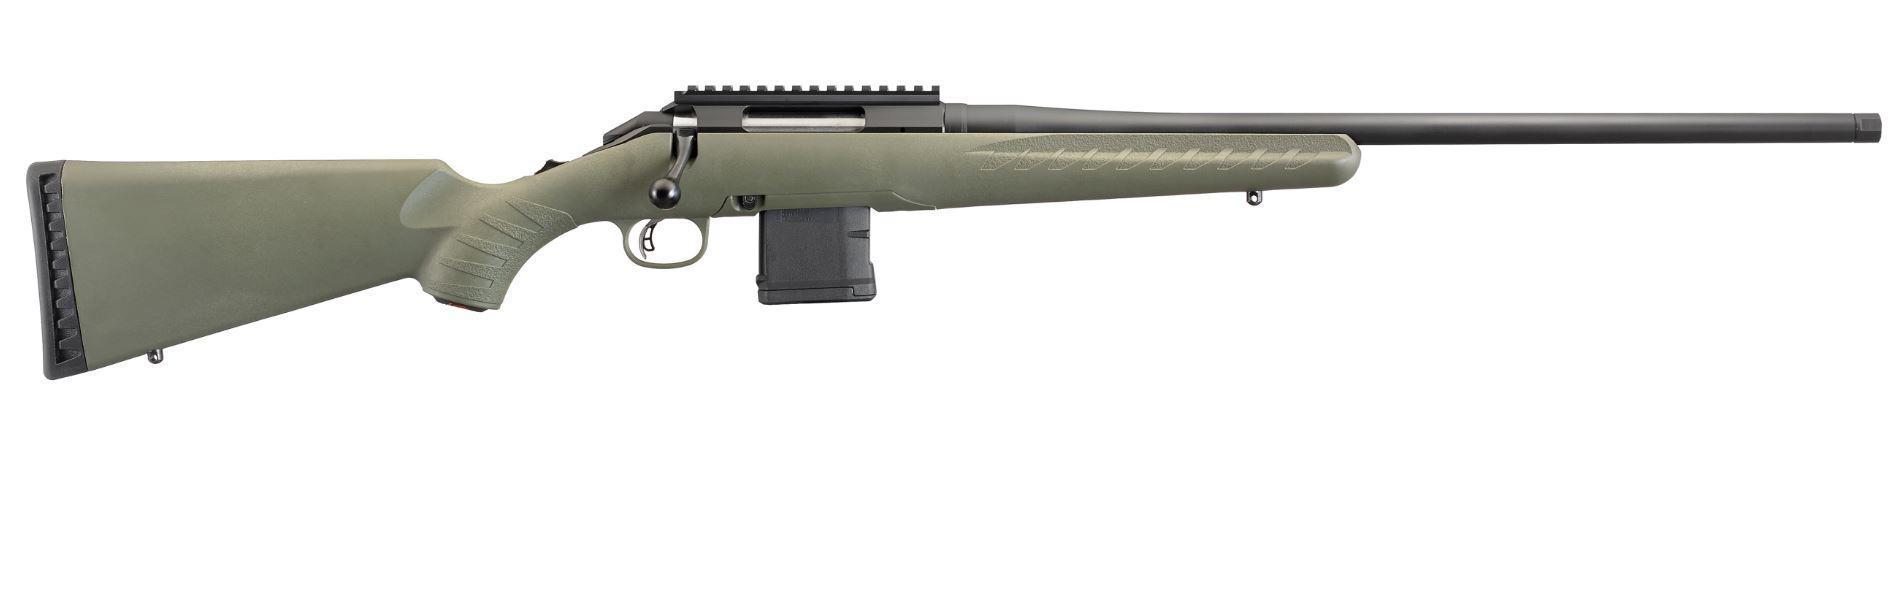 Ruger Predator American-img-2